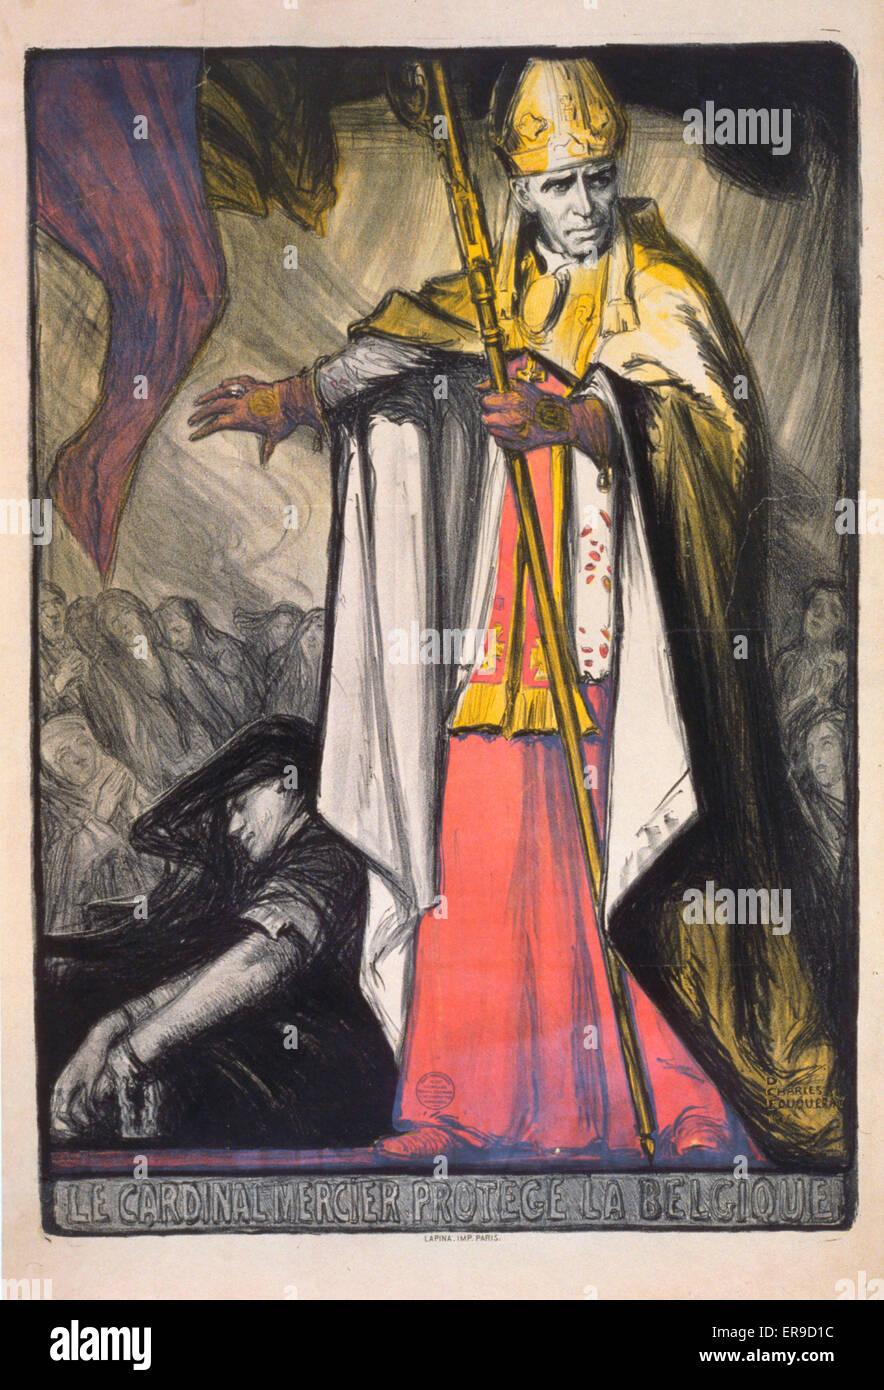 Full Figure View Of The Catholic Cardinal Mercier Desire Joseph 1851 1926 Became One Leaders Belgium During War